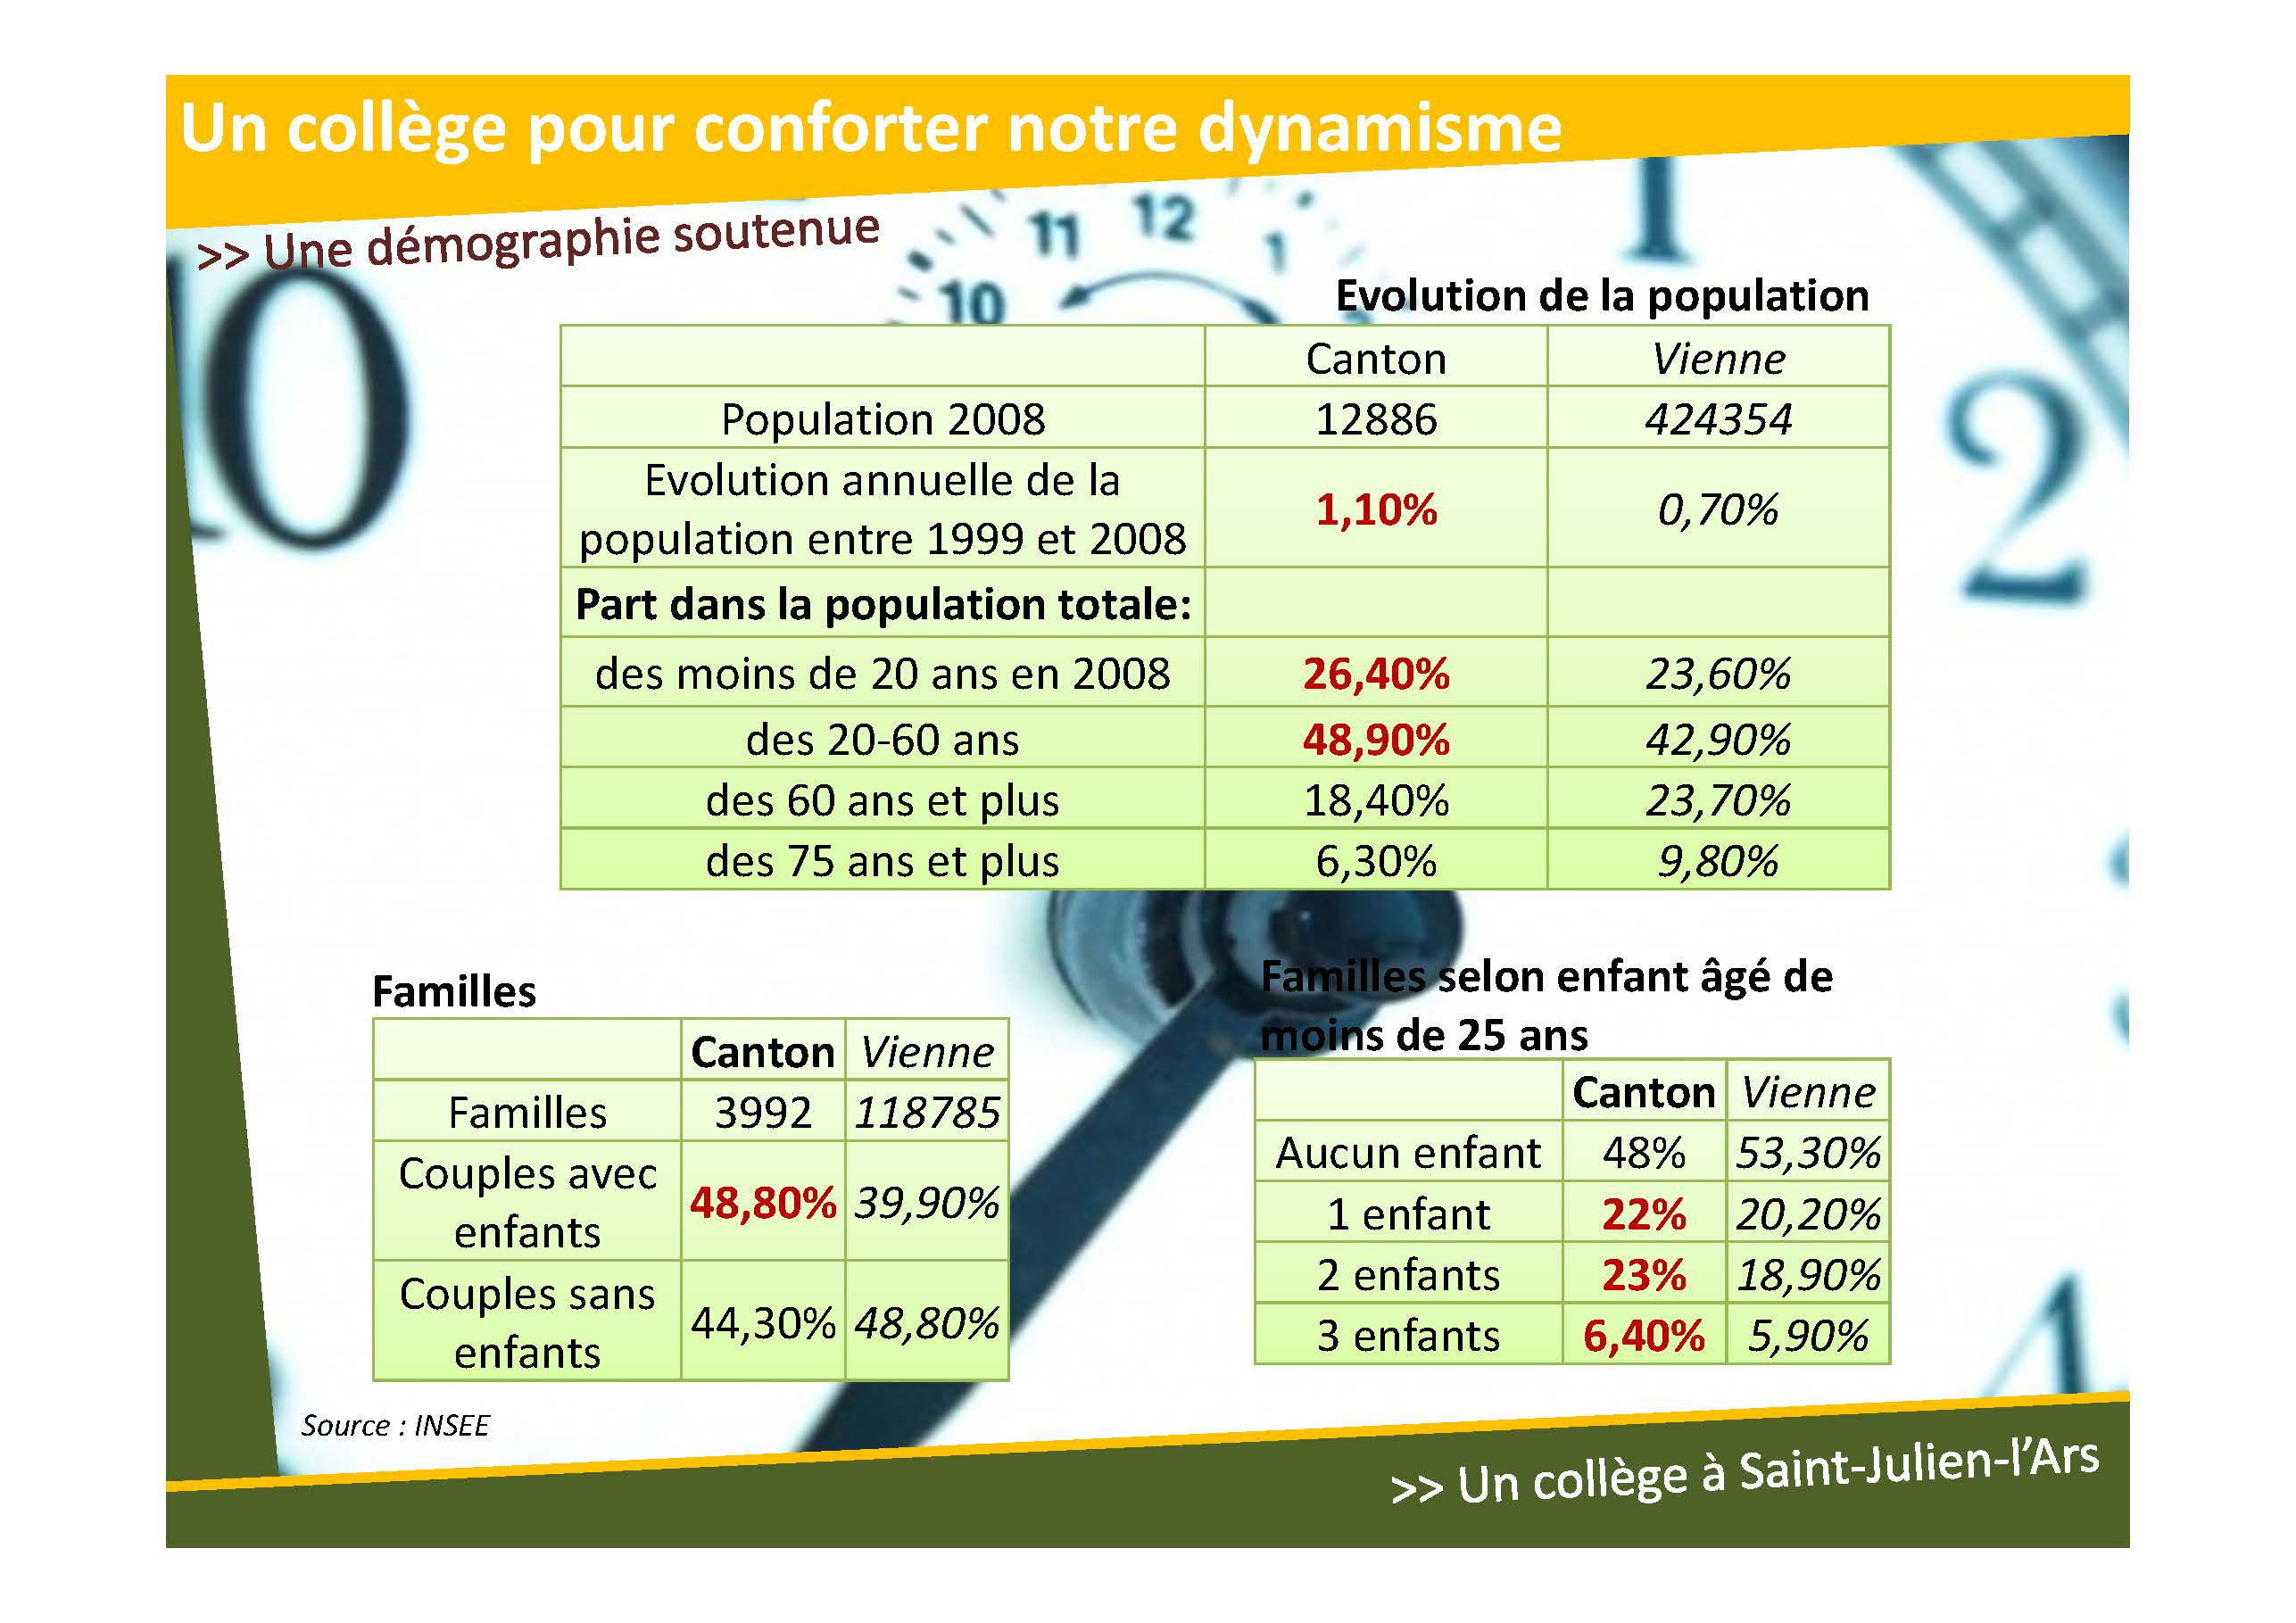 xaviermoinier-college_page_18